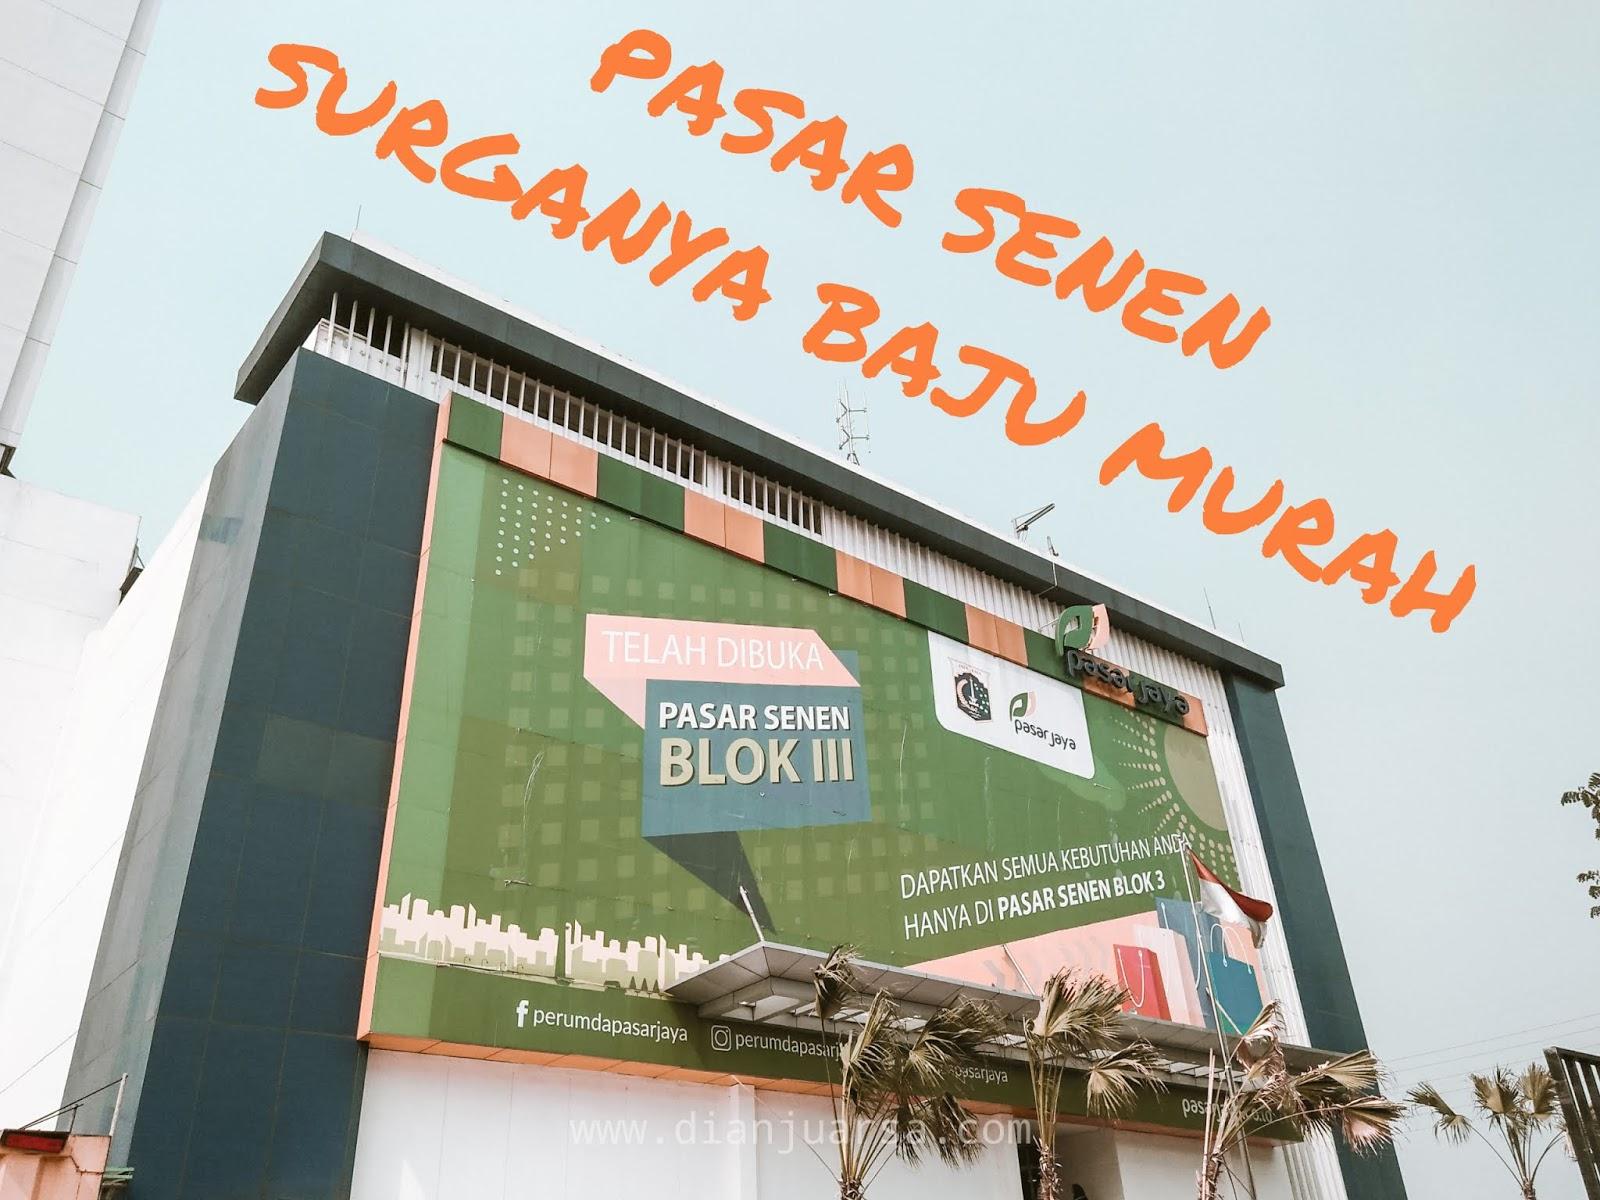 Pasar Senen Blok Iii Surganya Baju Bekas Murah Di Jakarta Pusat Untold Story